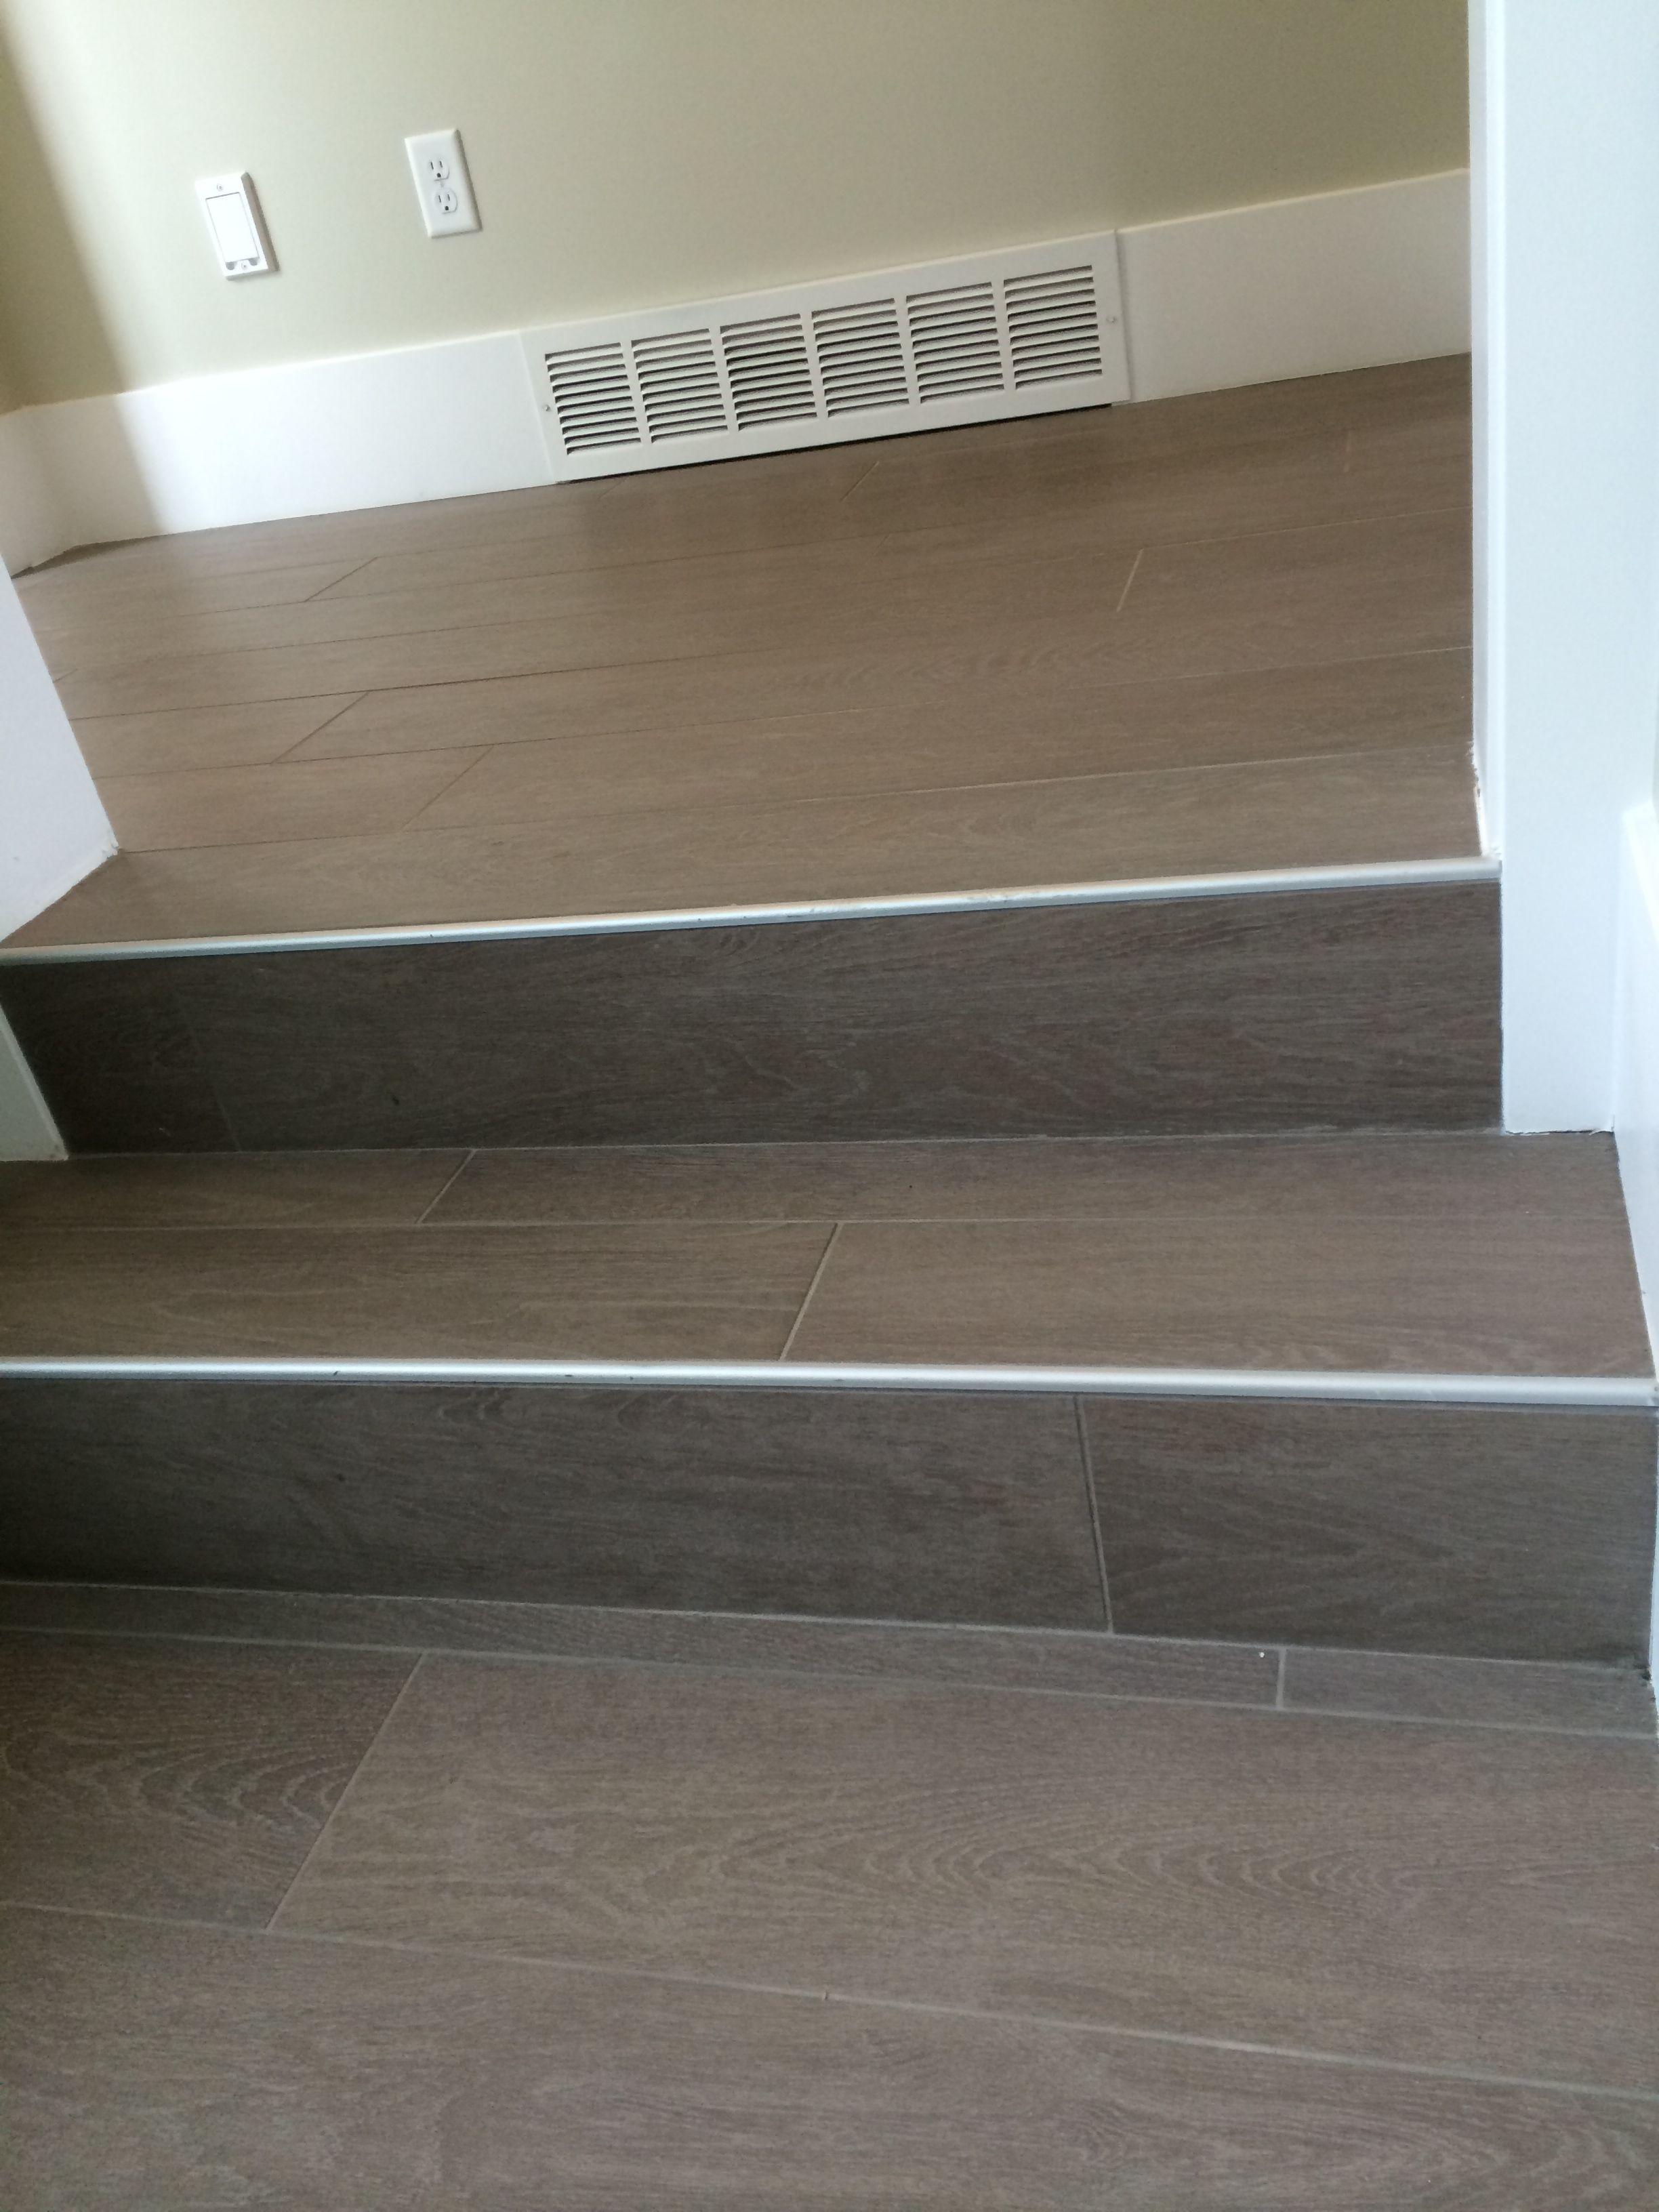 Wood floor tile on stairs with metal end cap